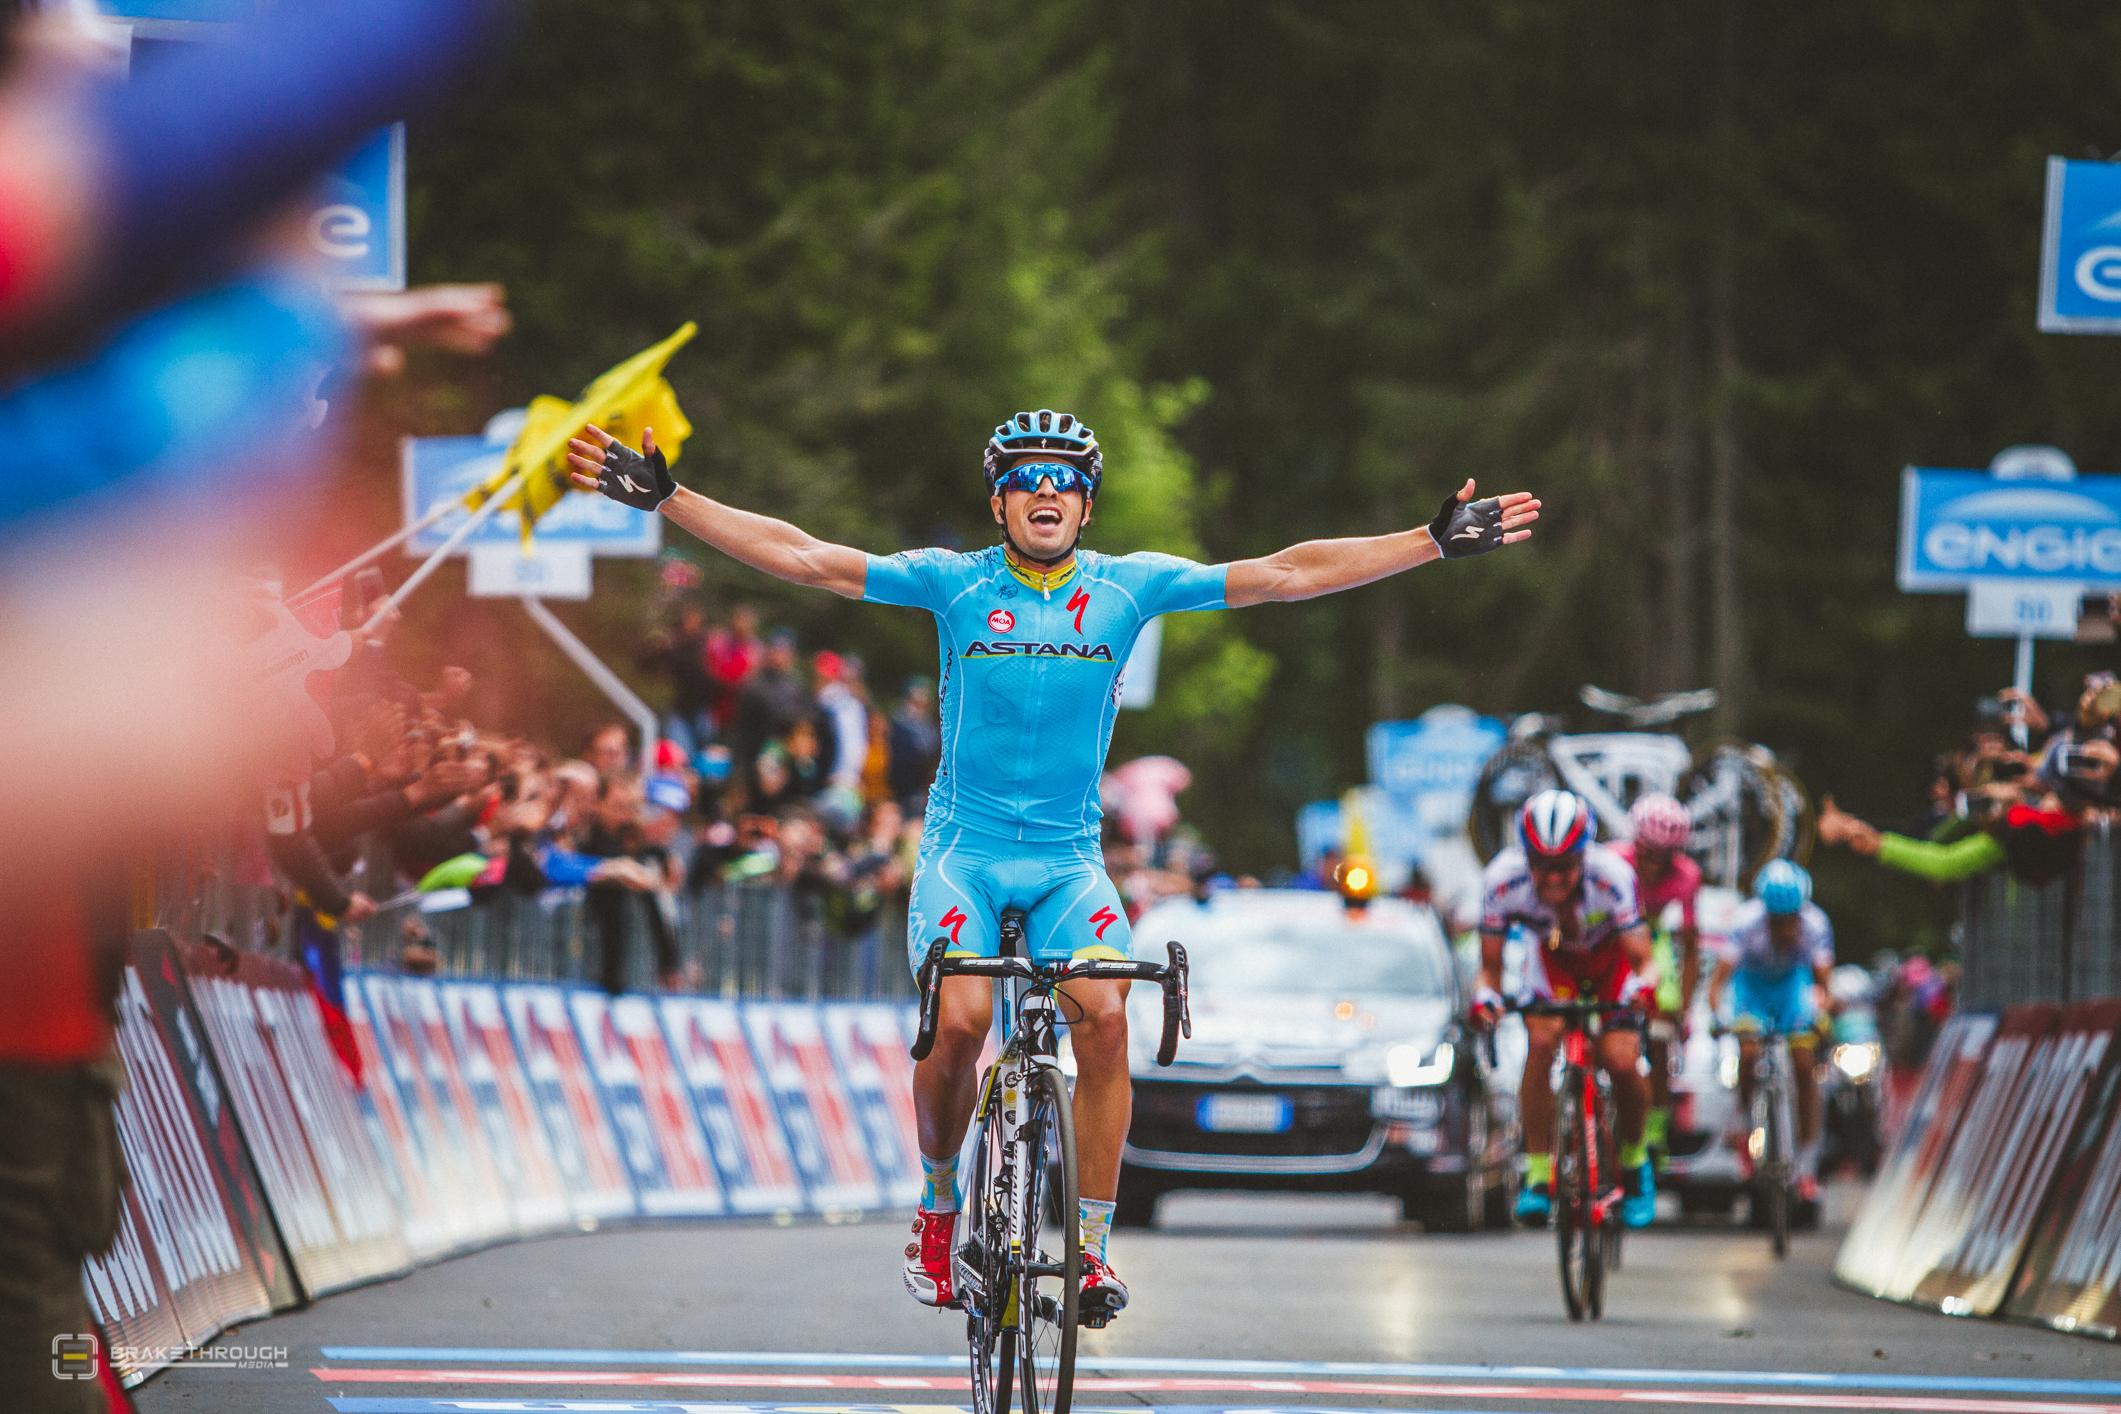 Foto: Thomas van Bracht / BrakeThrough Media (Team Astana)